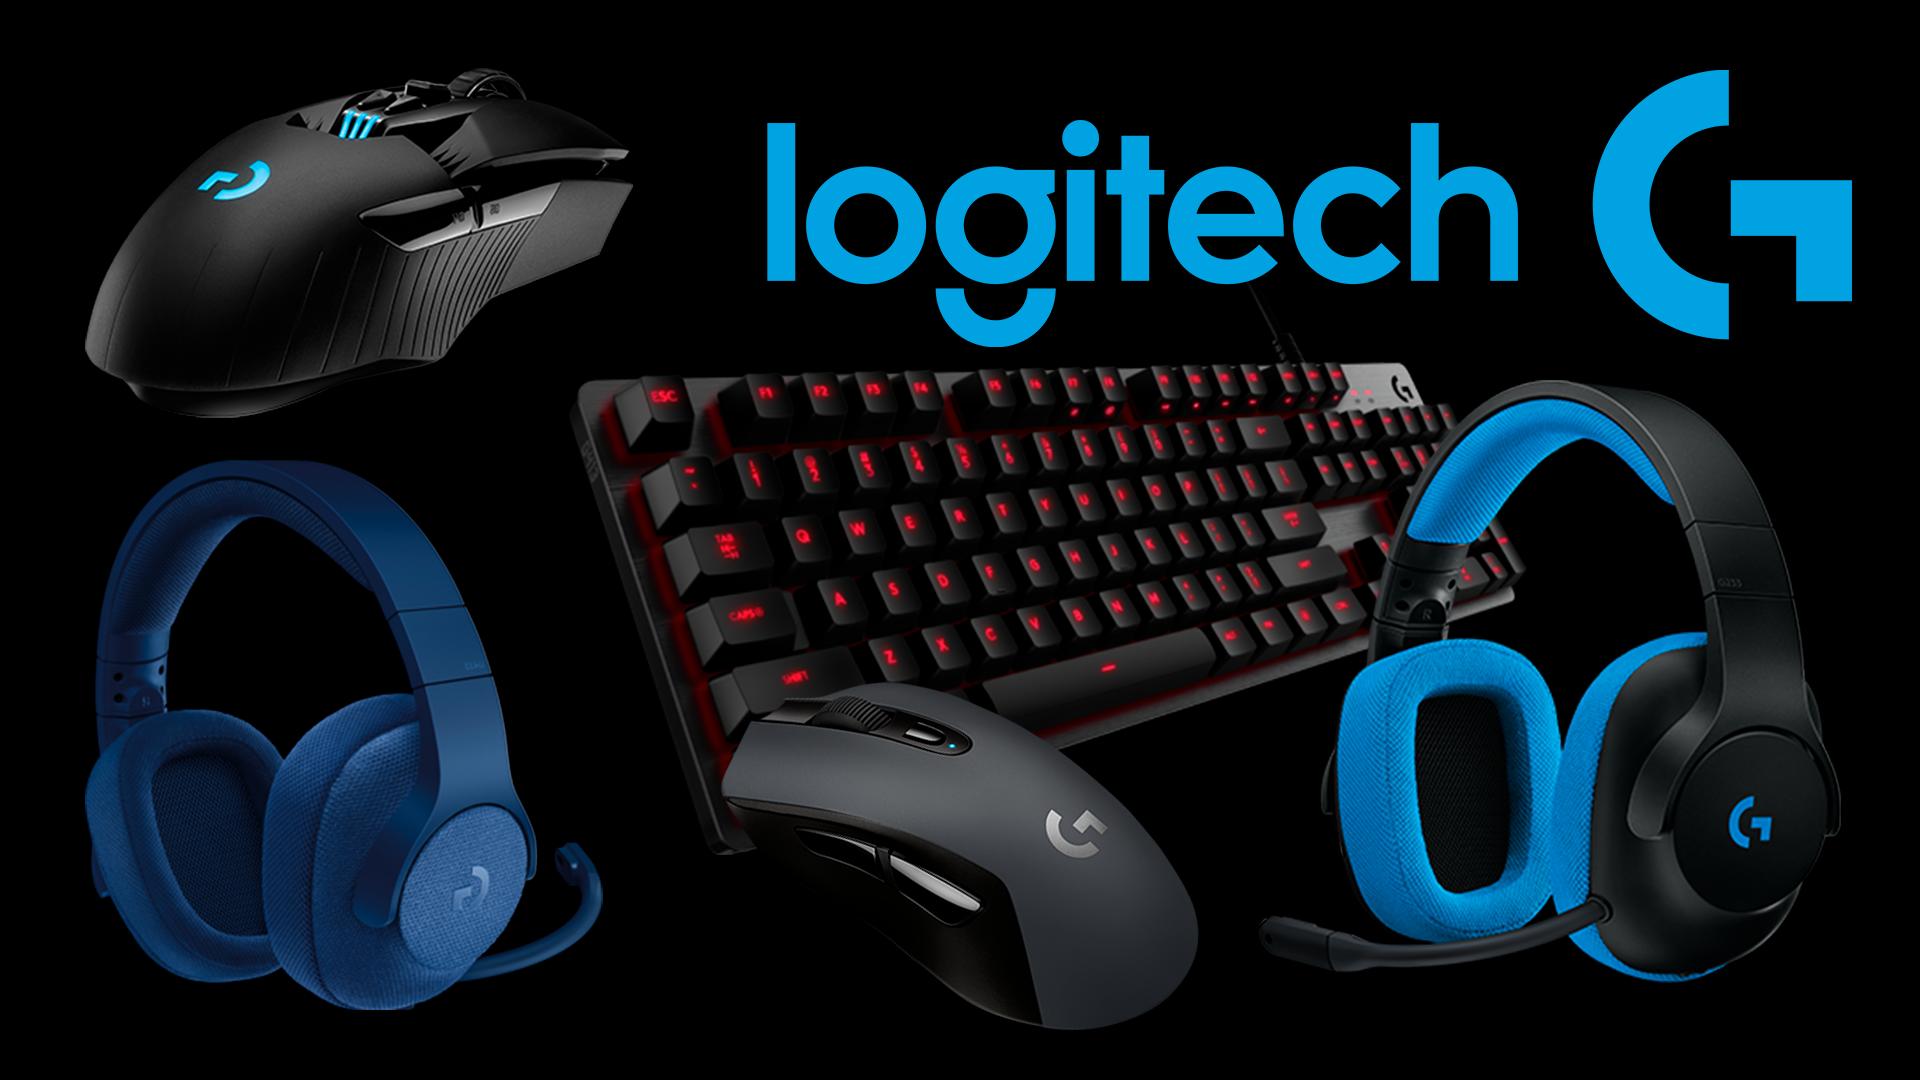 Logitech presentó sus nuevos periféricos gamer de alto rendimiento